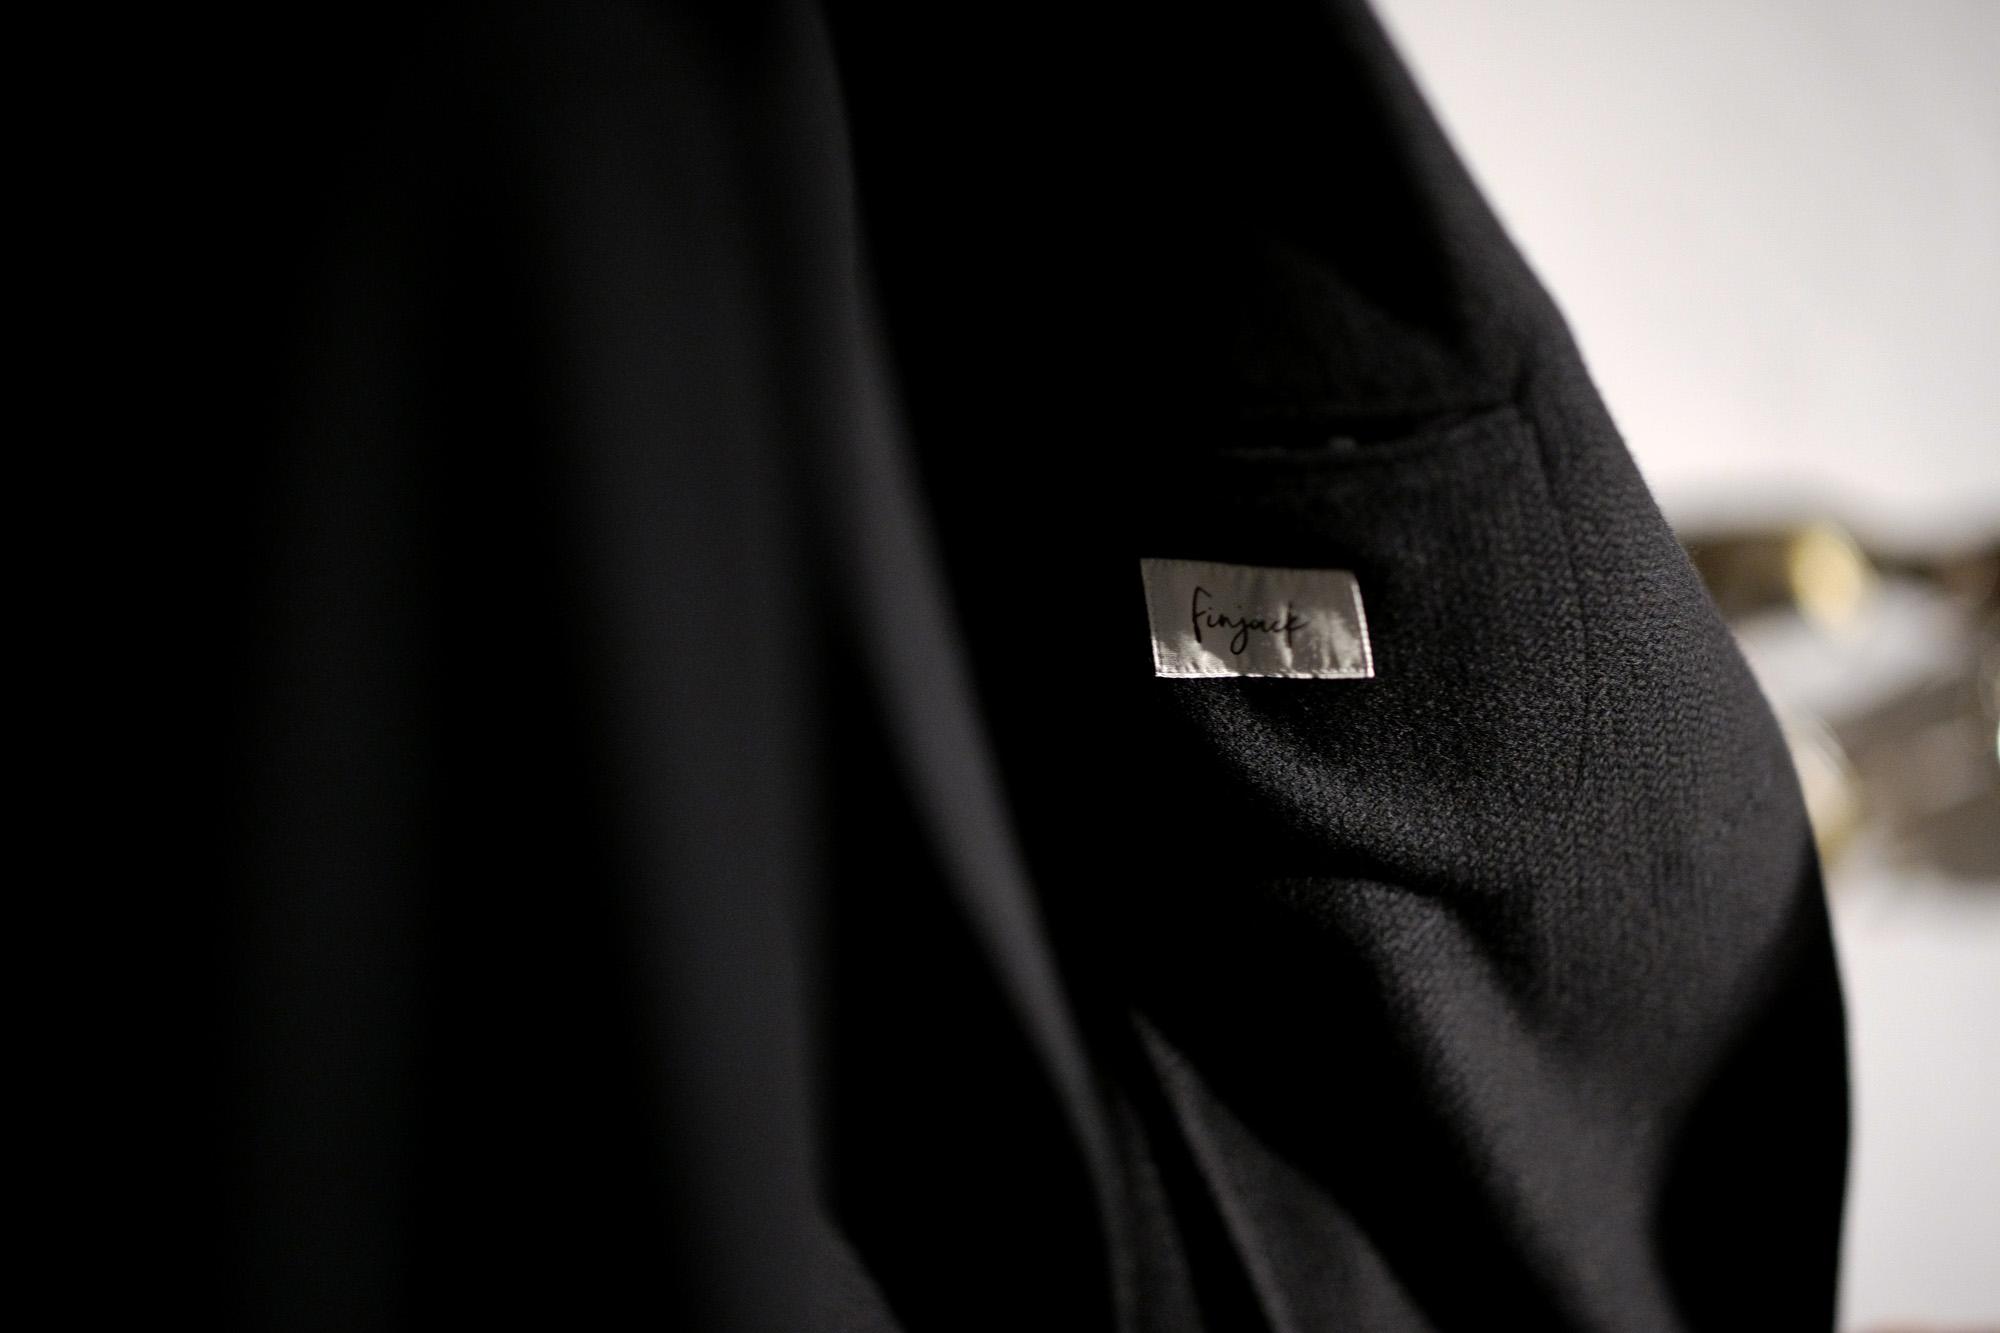 Finjack(フィンジャック) Cashmere 2B Jacket カシミヤ 2Bジャケット BLACK(ブラック) 2020 秋冬 【Special Model】愛知 名古屋 Alto e Diritto altoediritto アルトエデリット カシミヤジャケット カシミアジャケット 神藤光太郎 KOTARO SHINDO